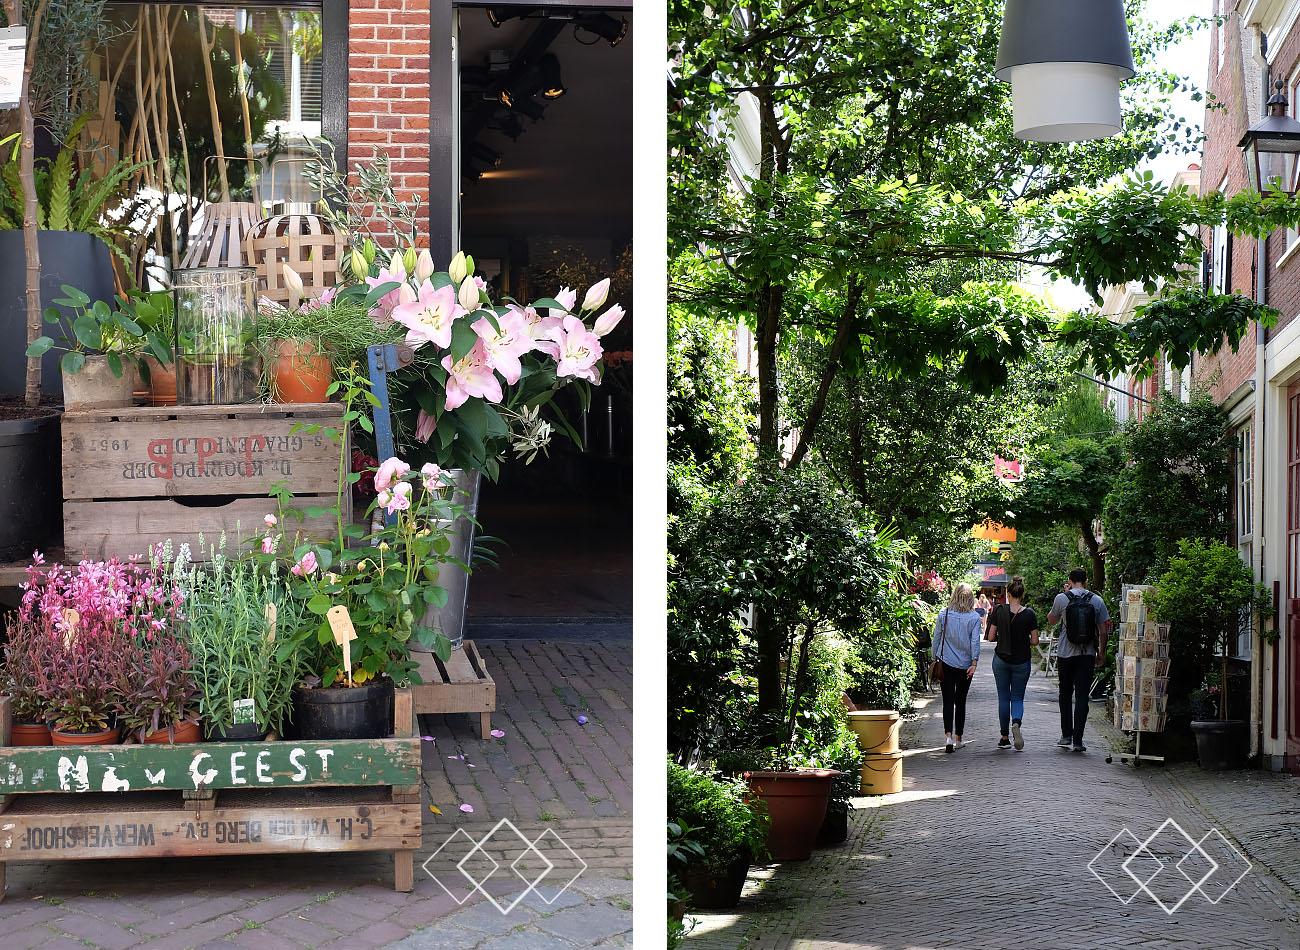 Haarlem - staand